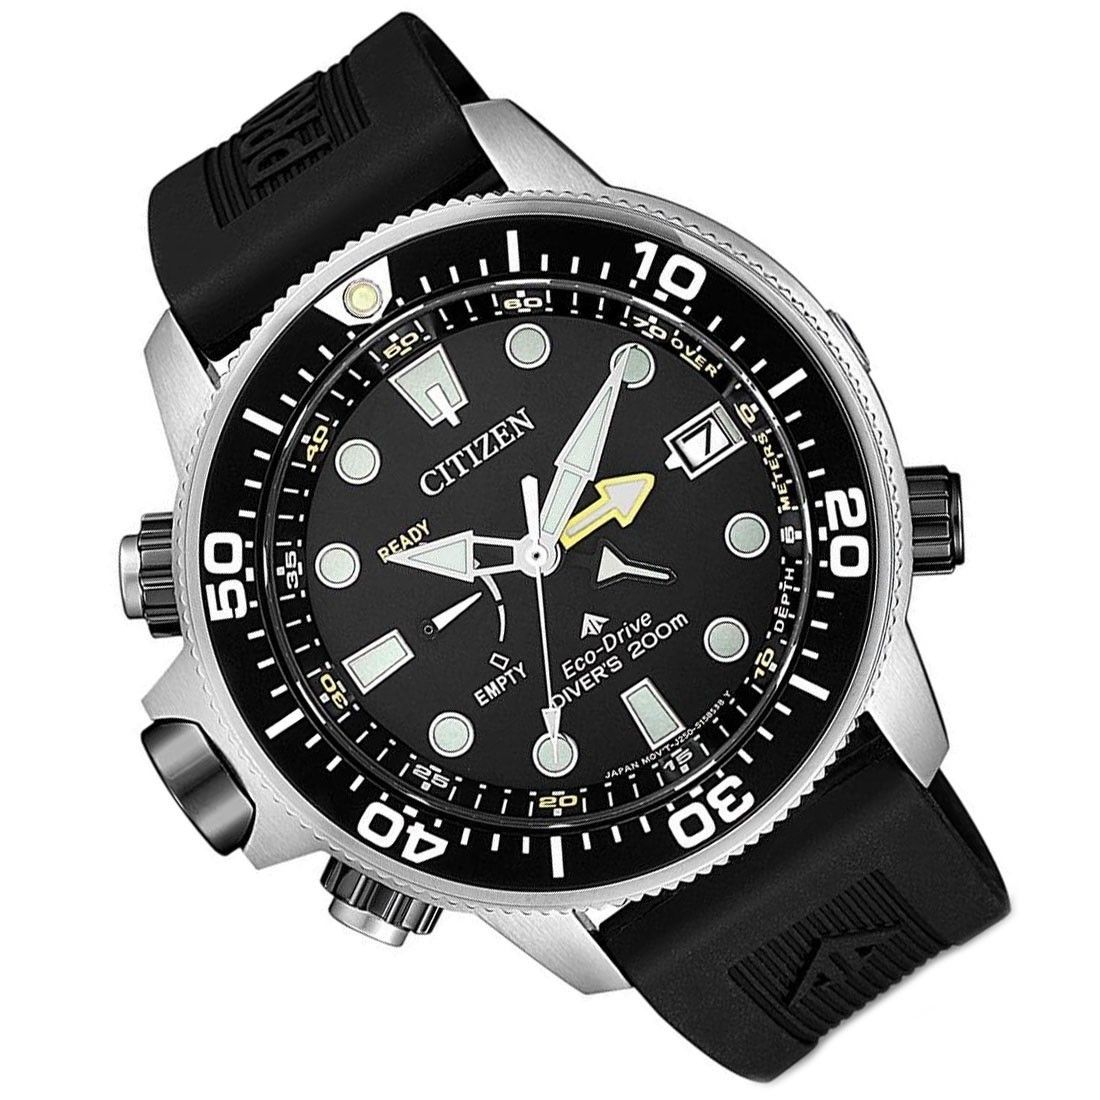 BN203614E BN203614 Citizen Promaster Diver Mens Watch in